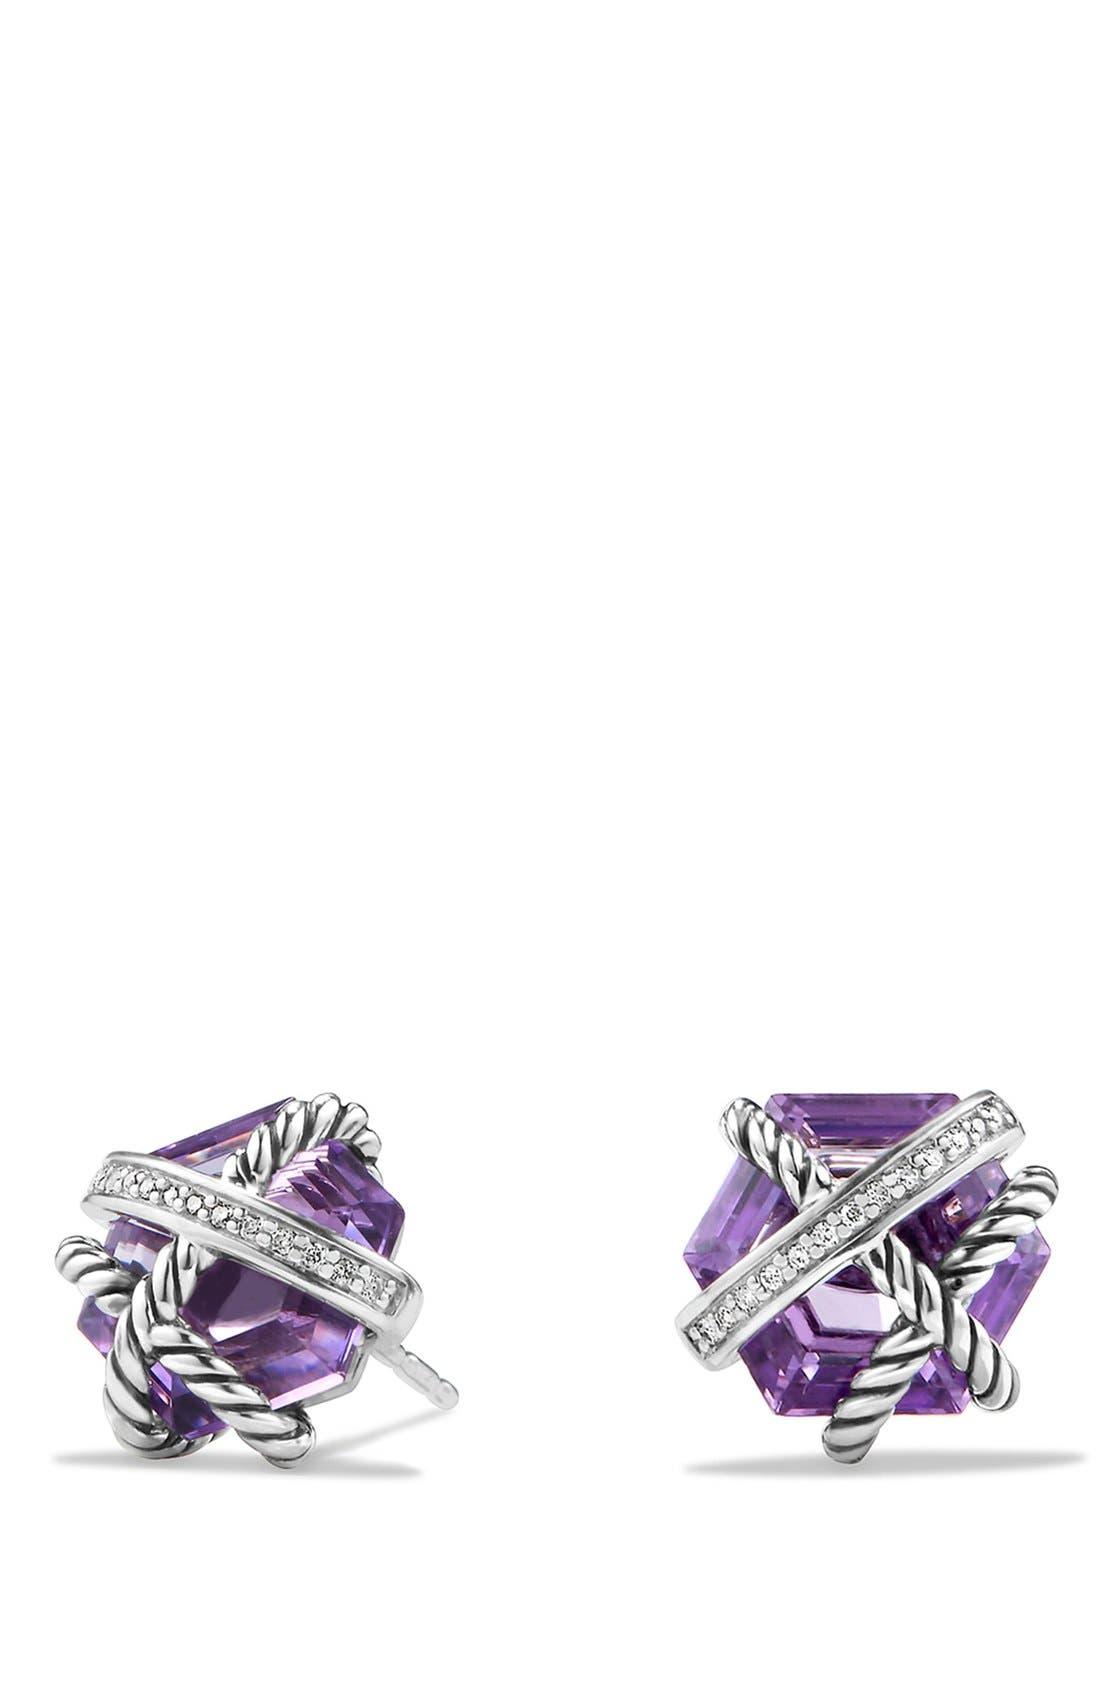 Main Image - David Yurman 'Cable Wrap' Earrings with Semiprecious Stones & Diamonds